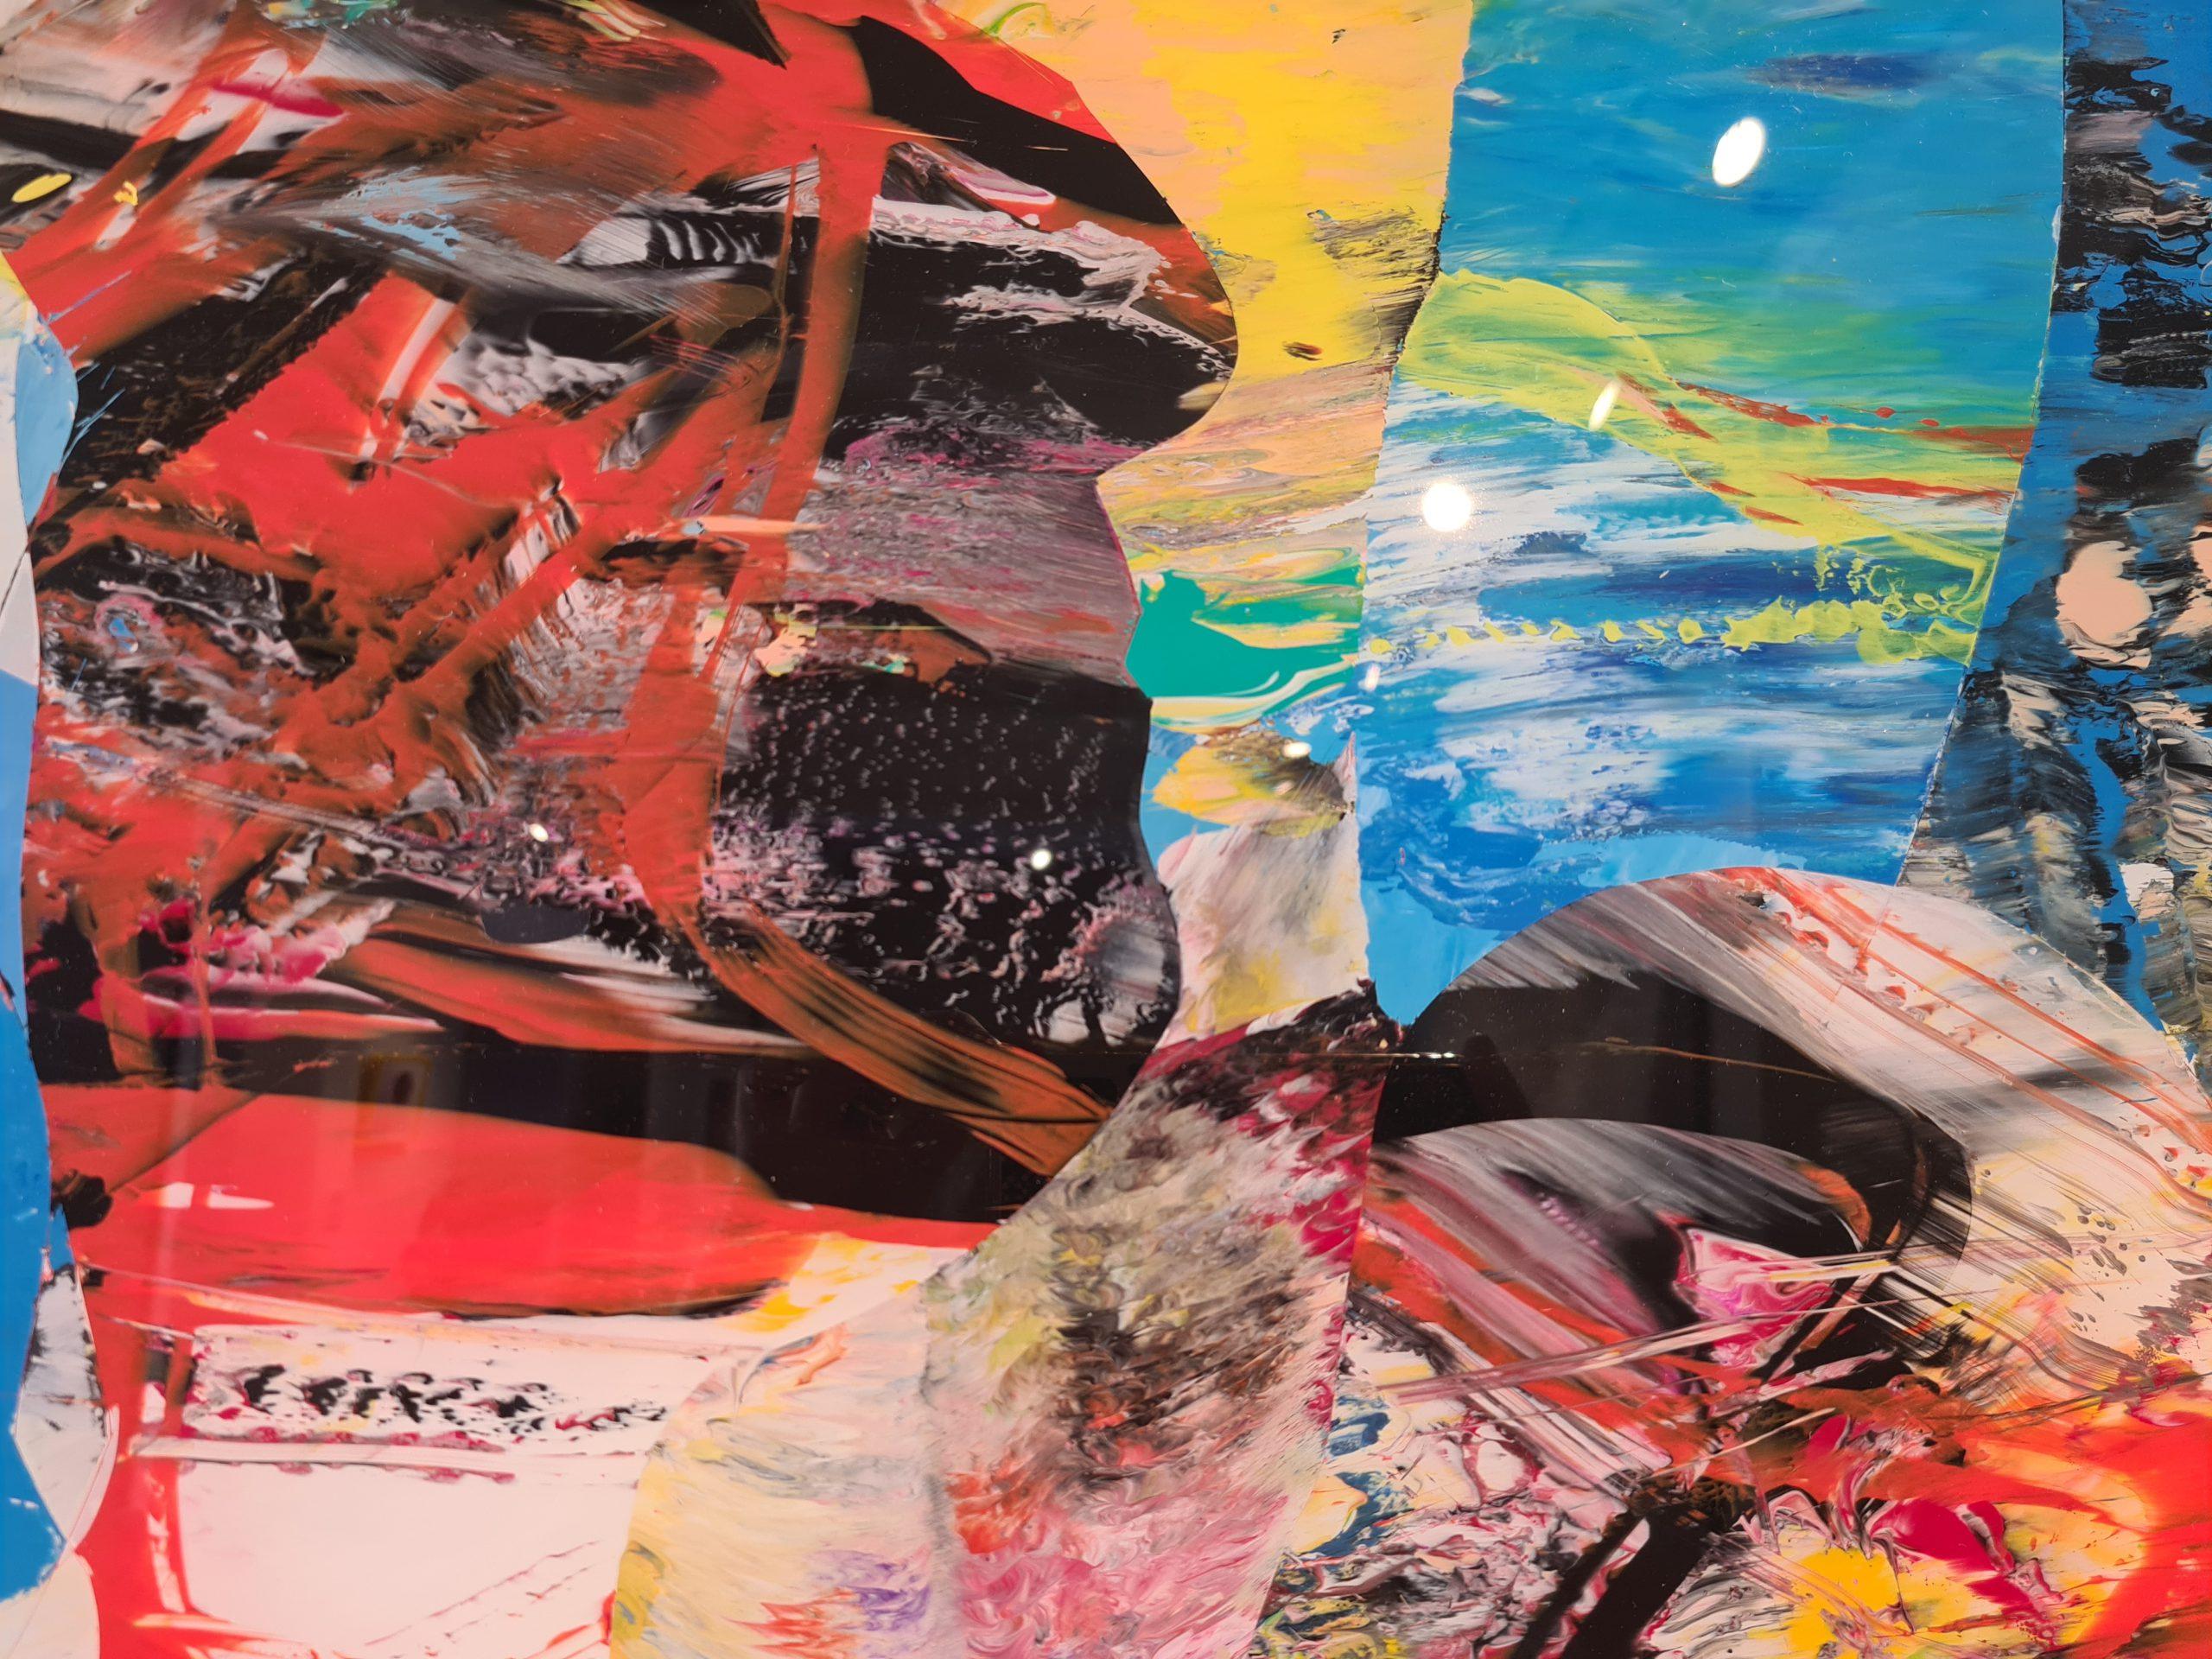 Kunst: FA43 van kunstenaar Jan van Lokhorst